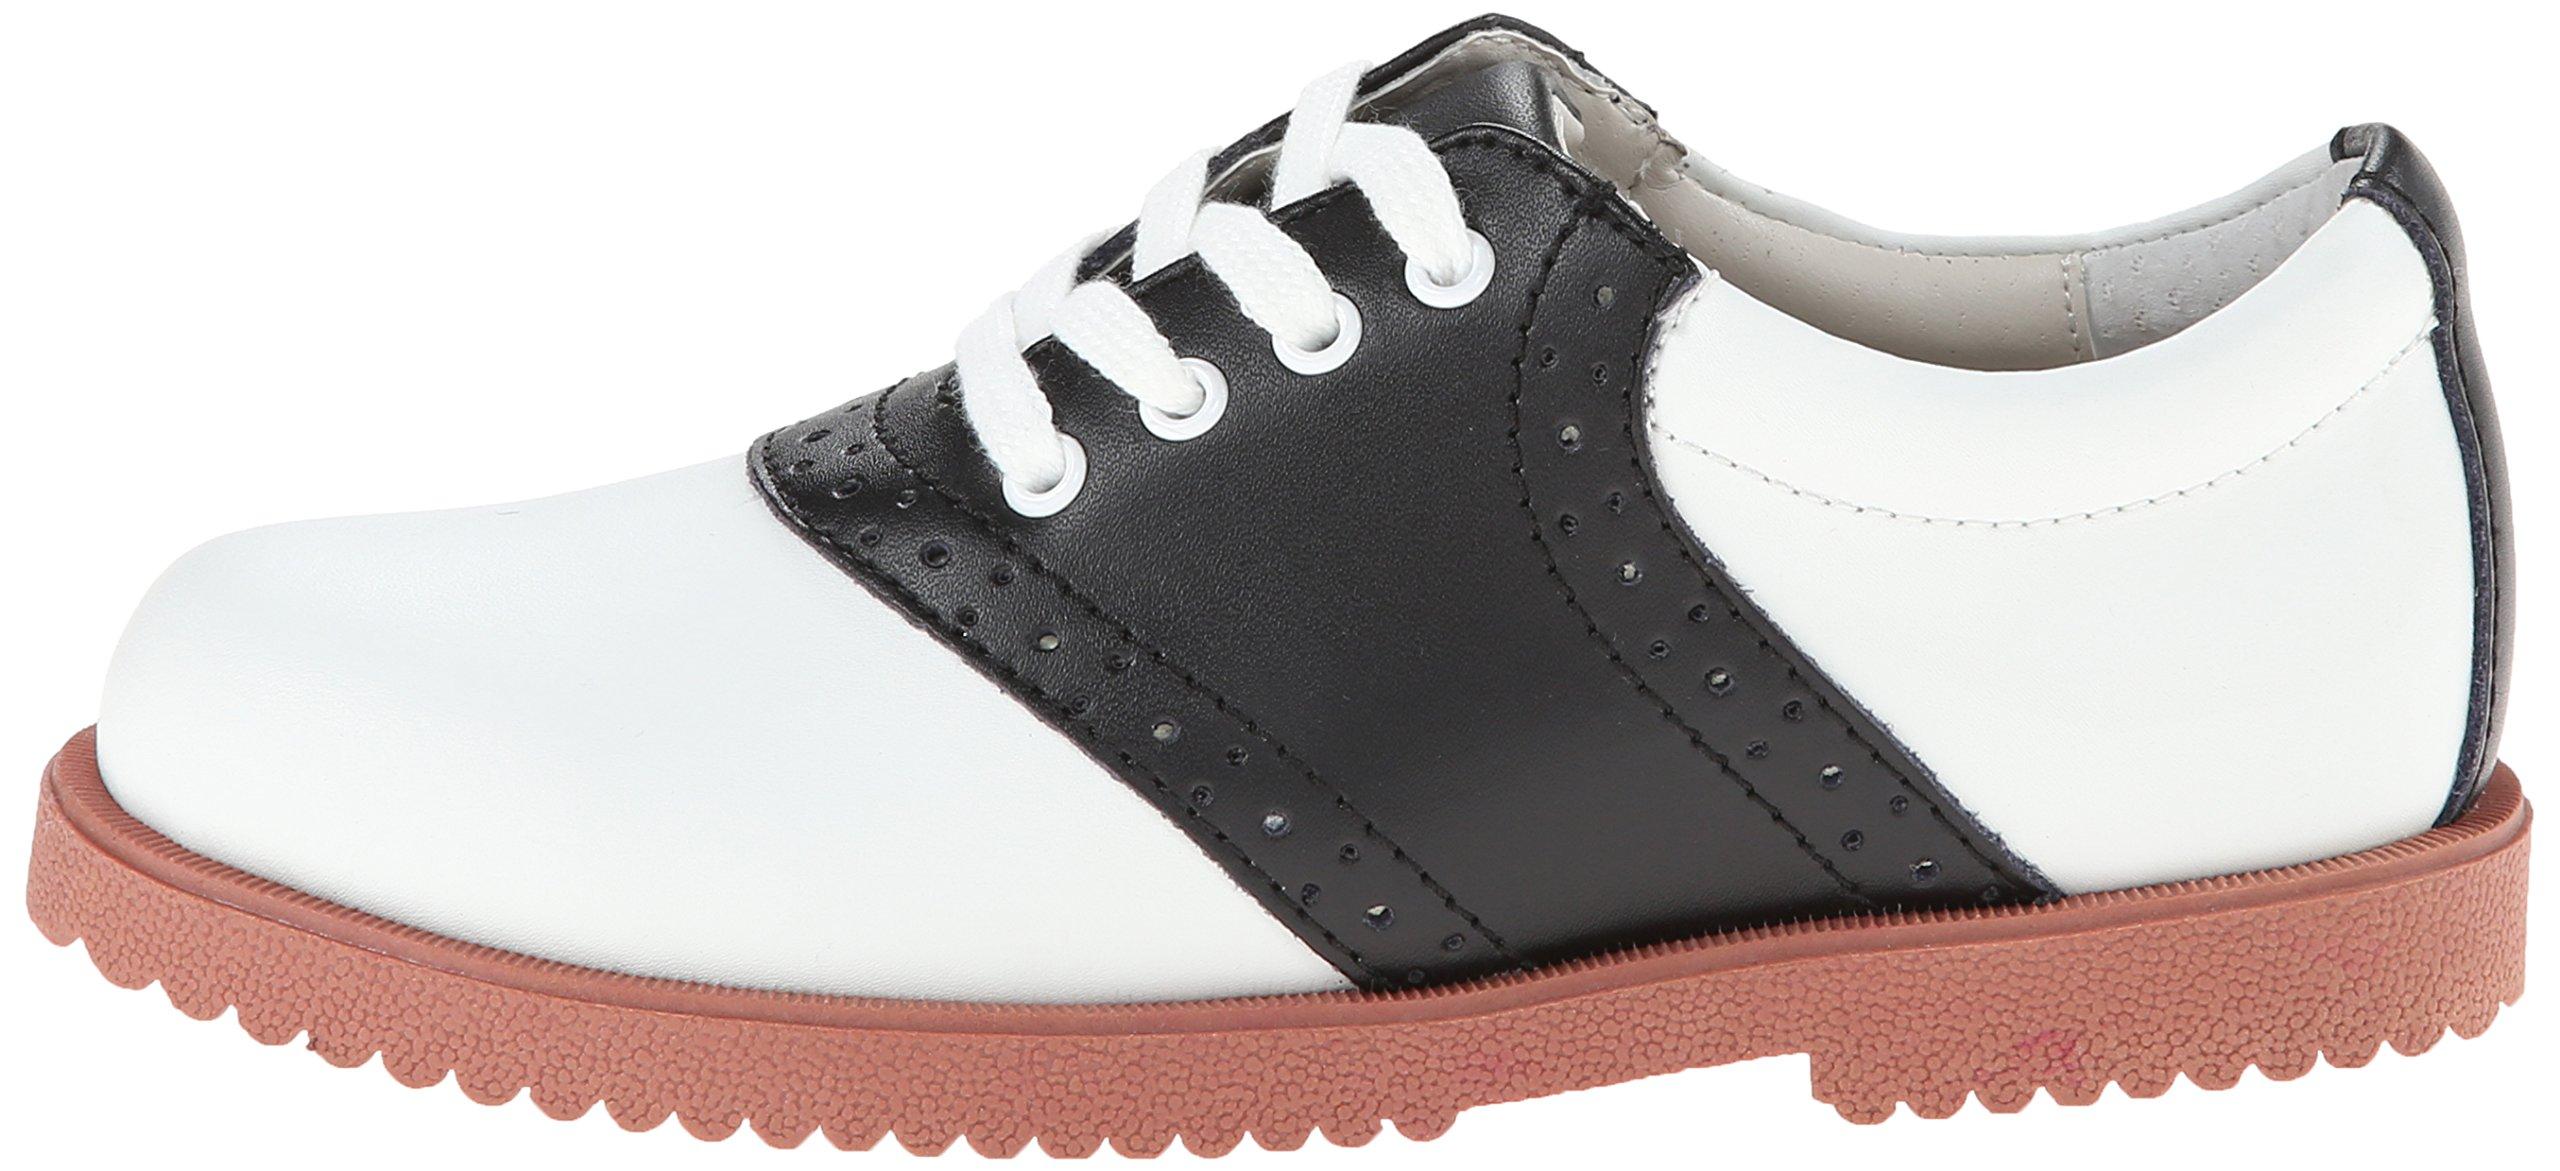 Academie Gear Honor Roll Saddle Shoe (Toddler/Little Kid/Big Kid),White/Black,4 W US Big Kid by Academie Gear (Image #5)